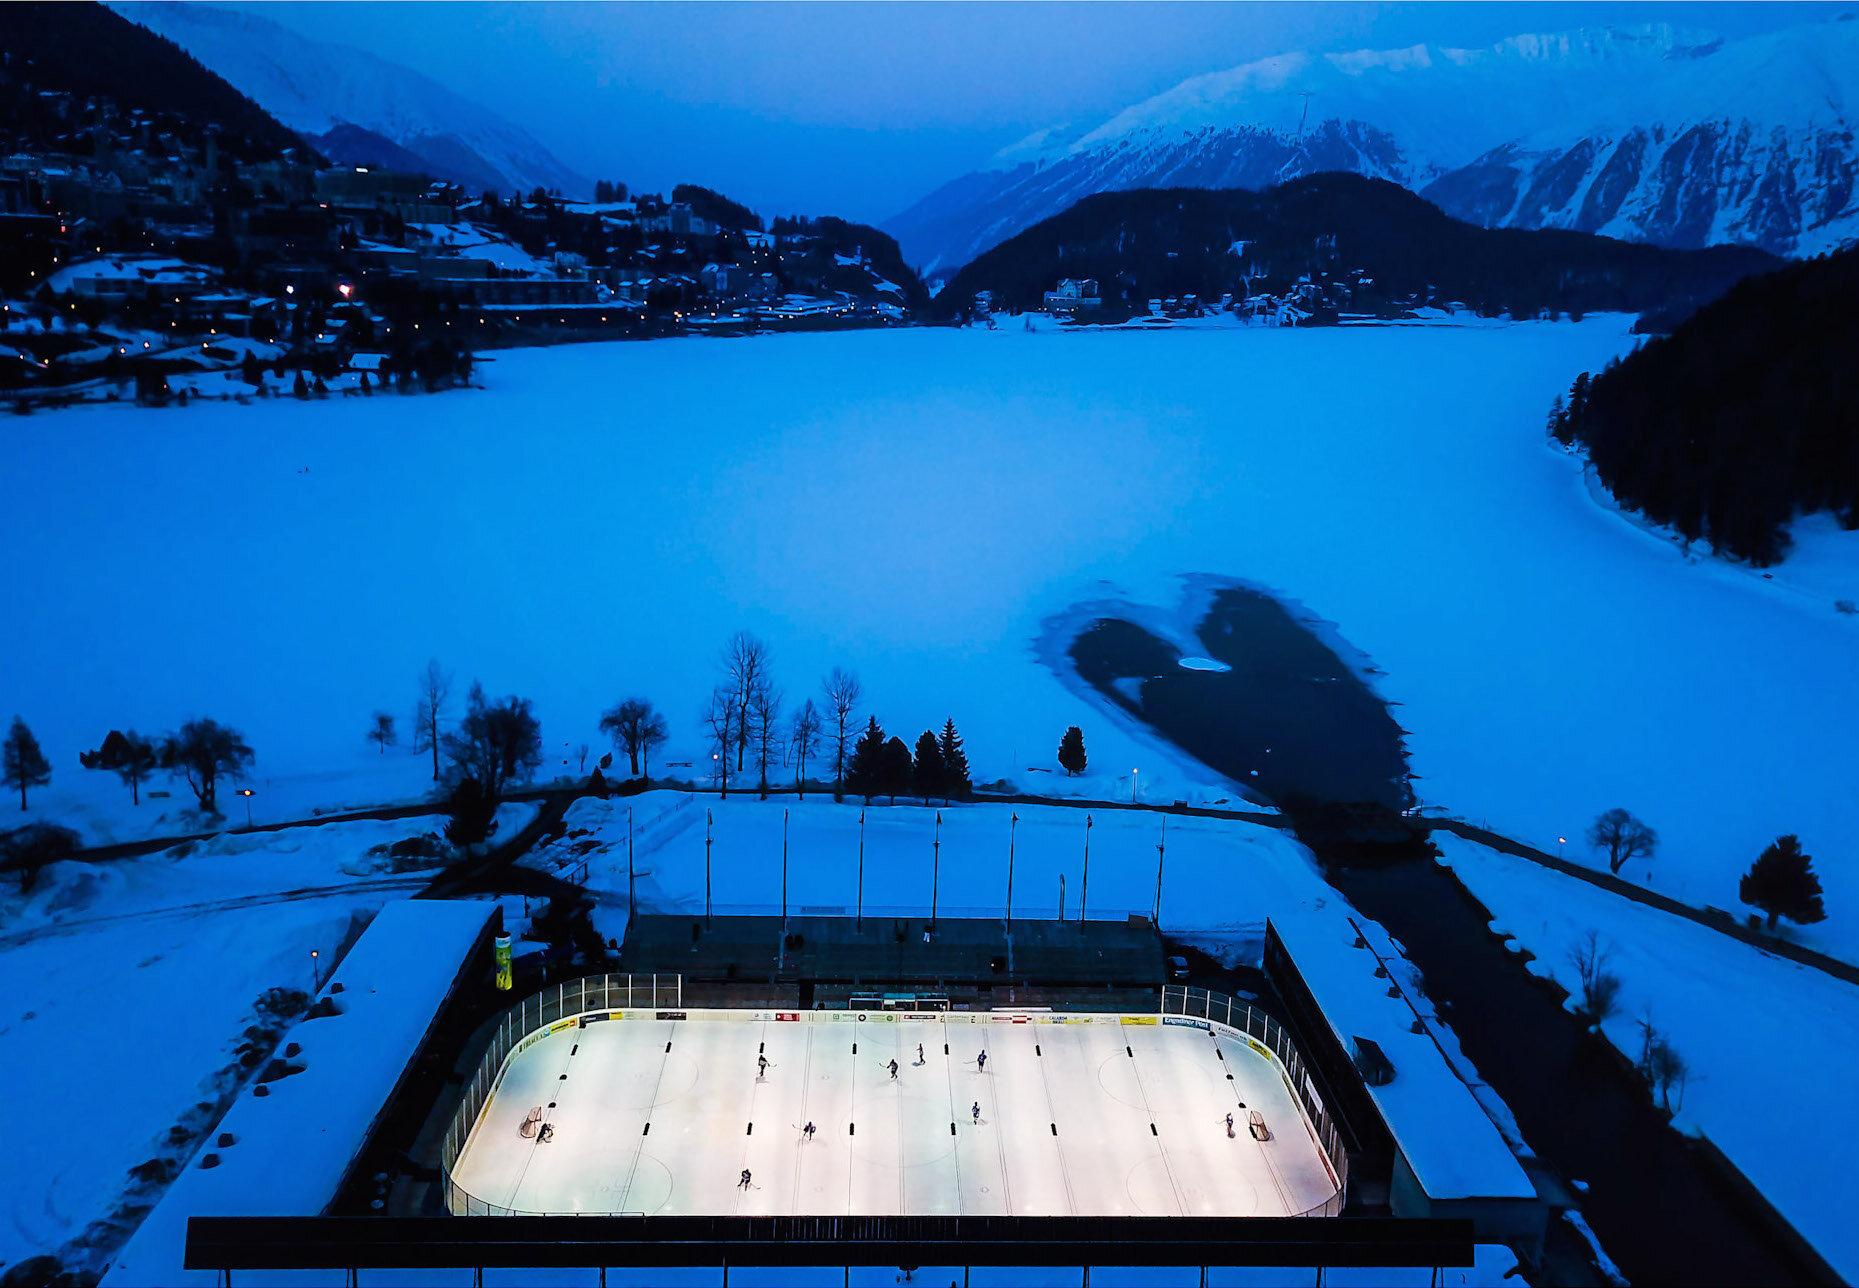 David Ondaatje   The Varsity Match, St. Moritz, Switzerland  47.5 x 34 inch Archival Pigment Print